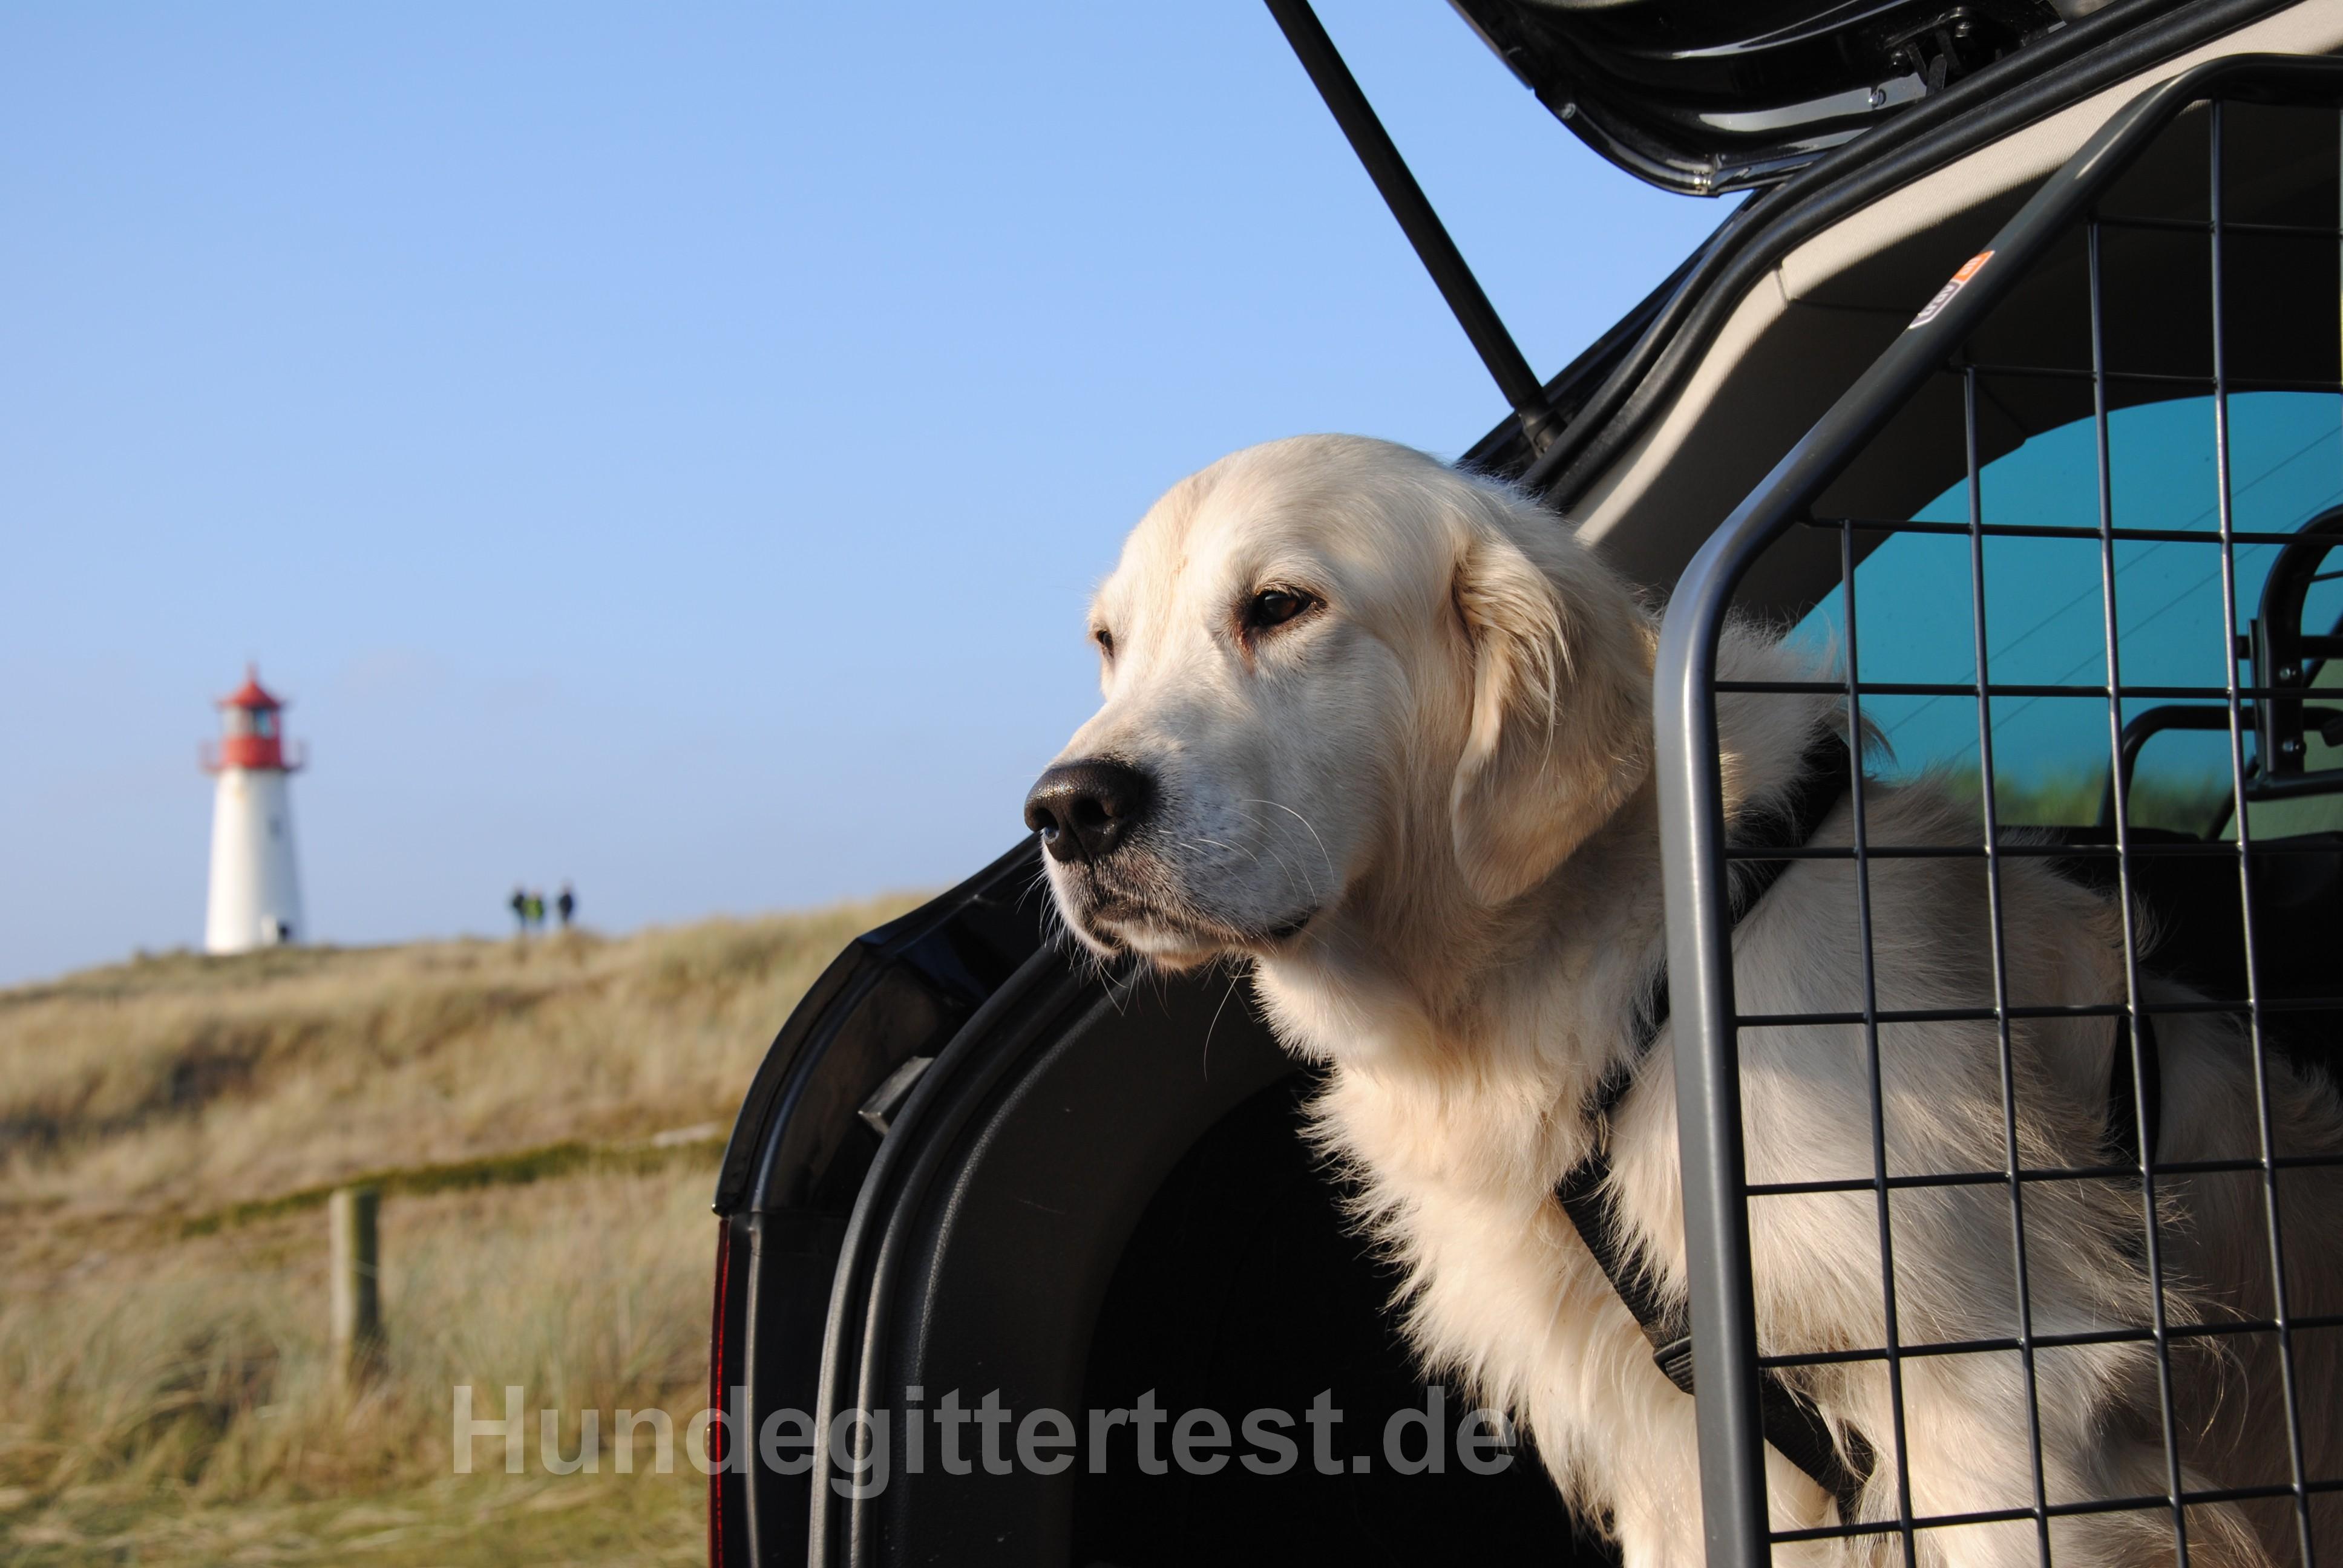 Hundegitter für den sicheren Transport